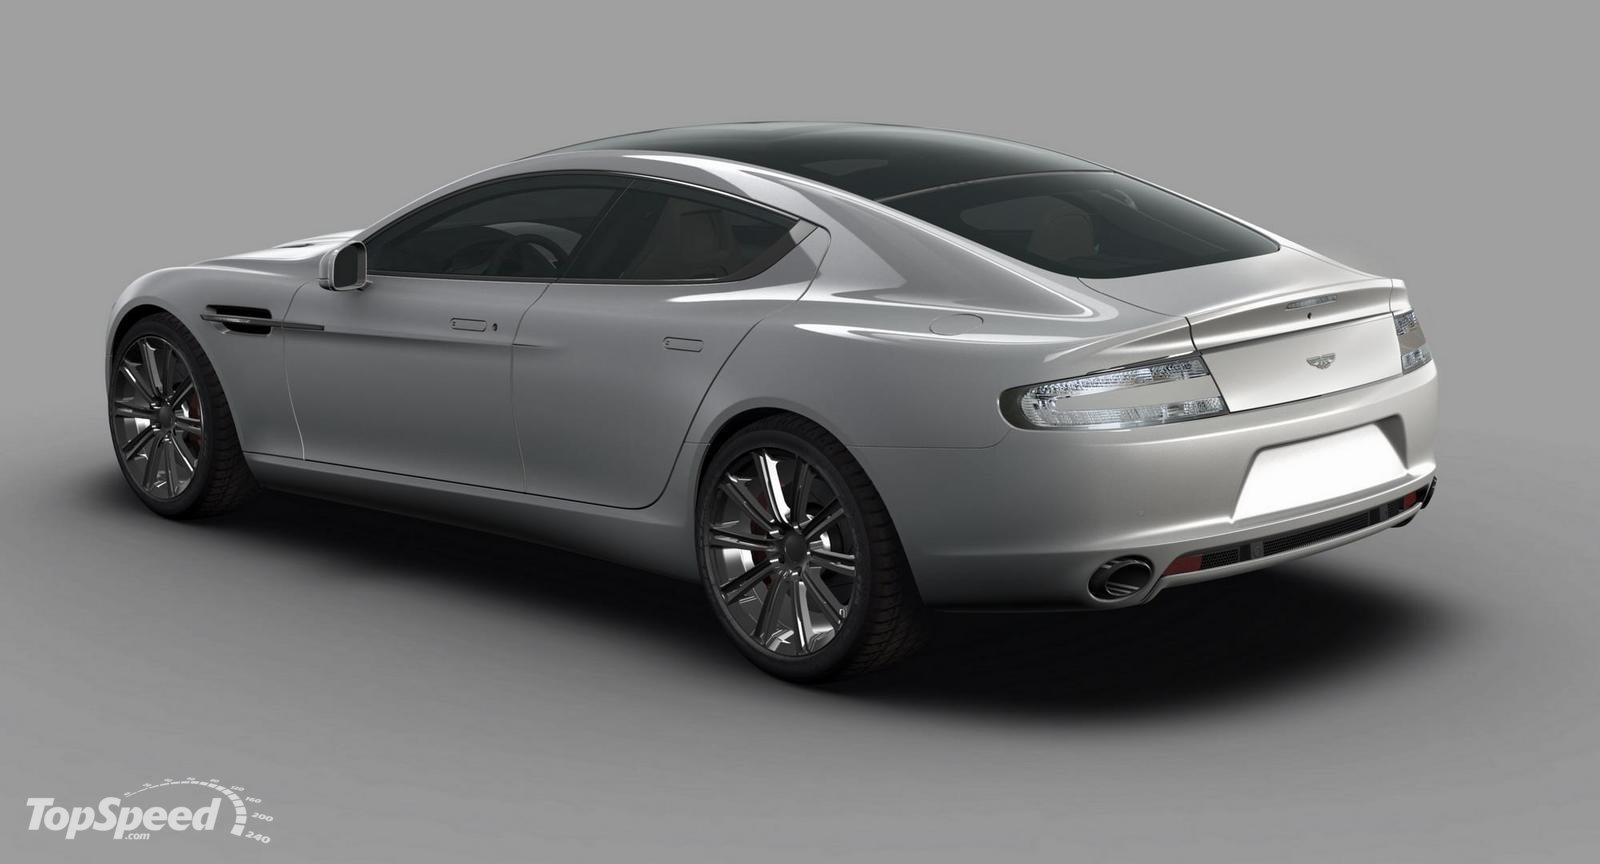 2010 Aston Martin Rapide Image 20